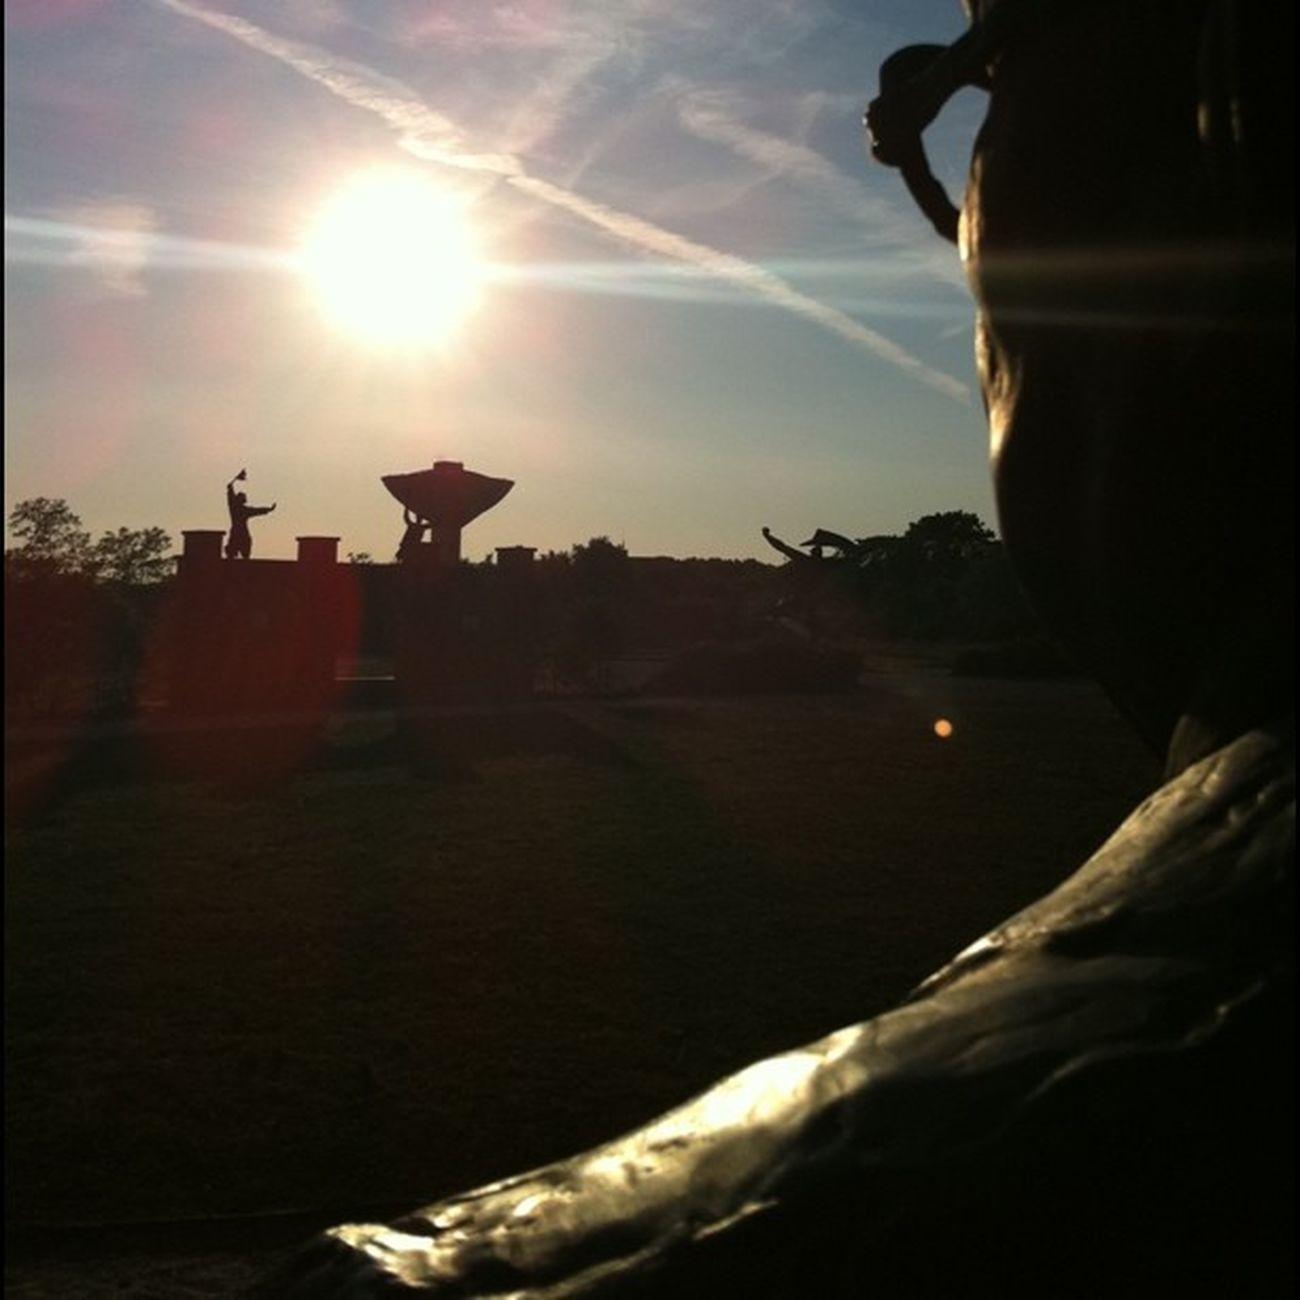 kommunistischer sonnenanbeter #mementopark #budapest Budapest Mementopark